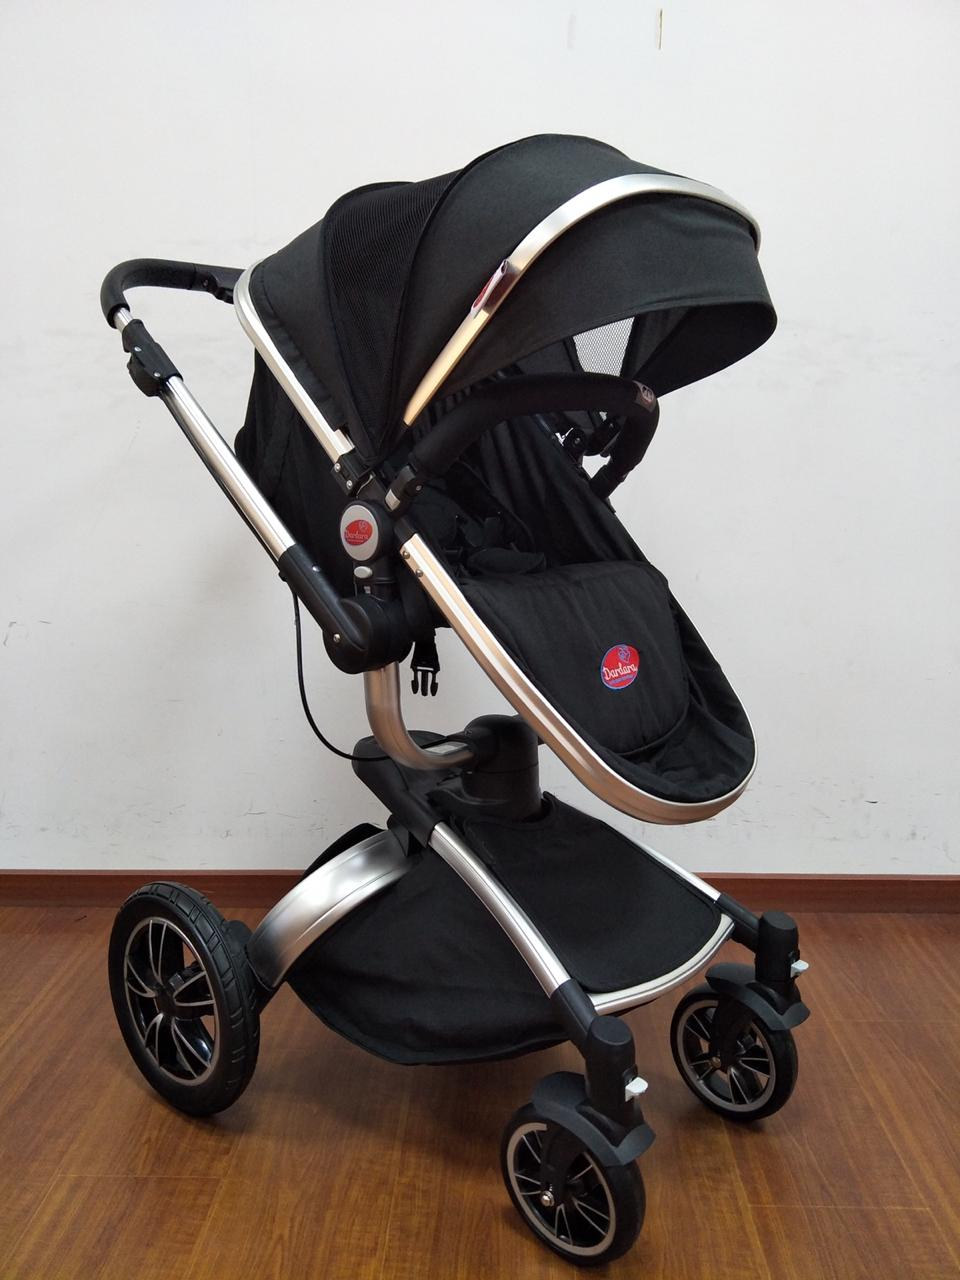 Carrinho de Bebê Giro 360º C/ Bebê Conforto - Preto